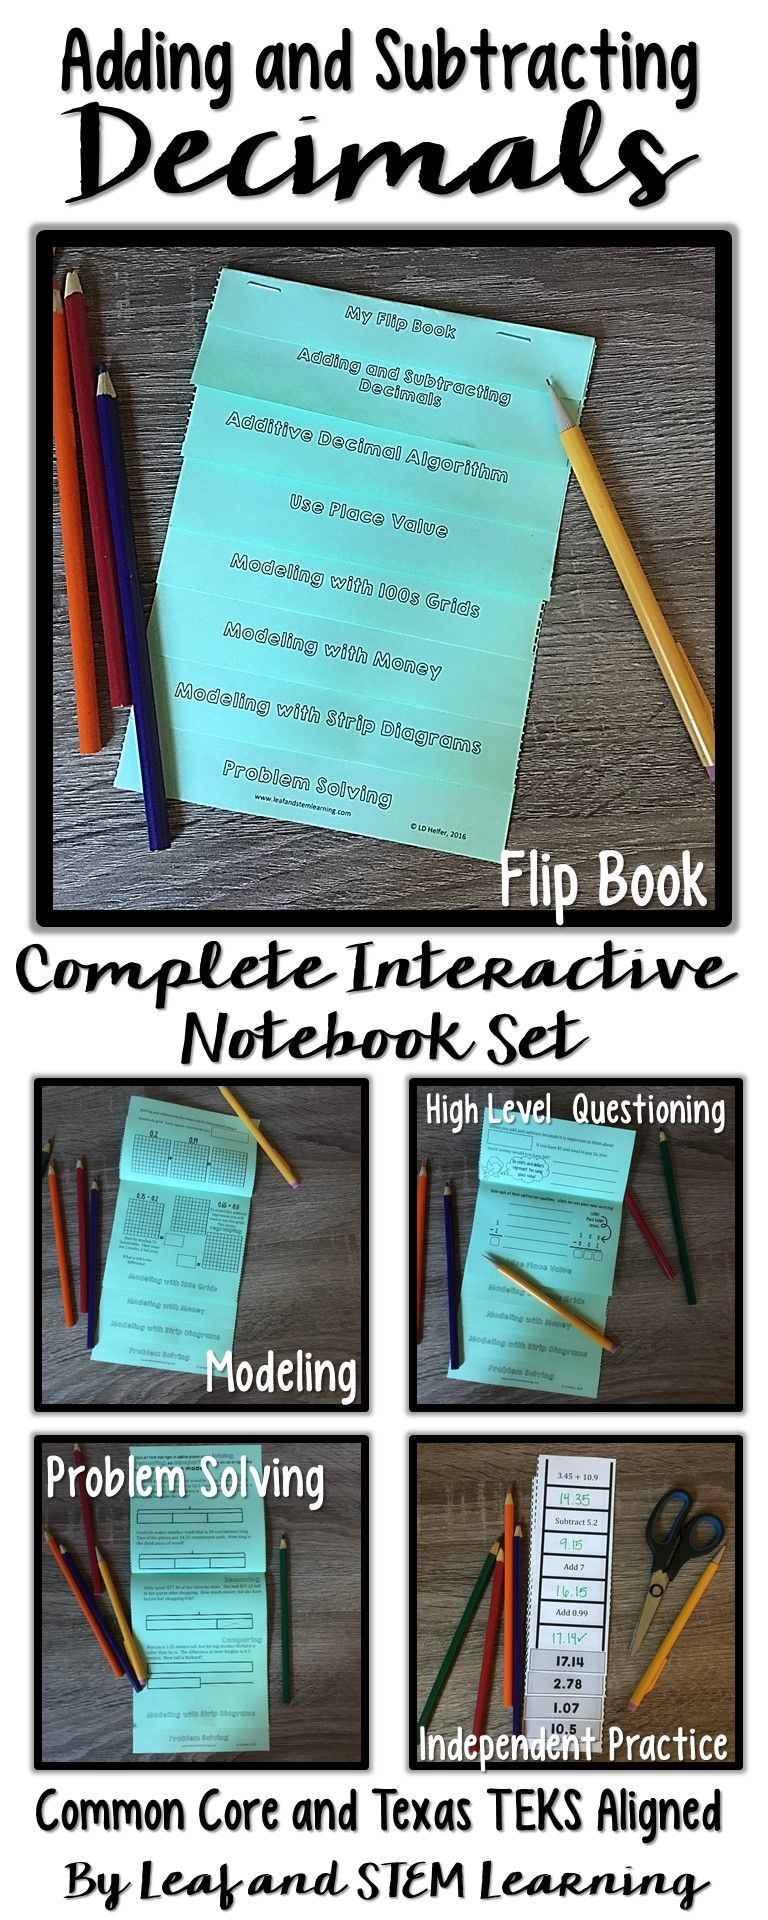 Adding and Subtracting Decimals Interactive Notebook Set | Flip ...